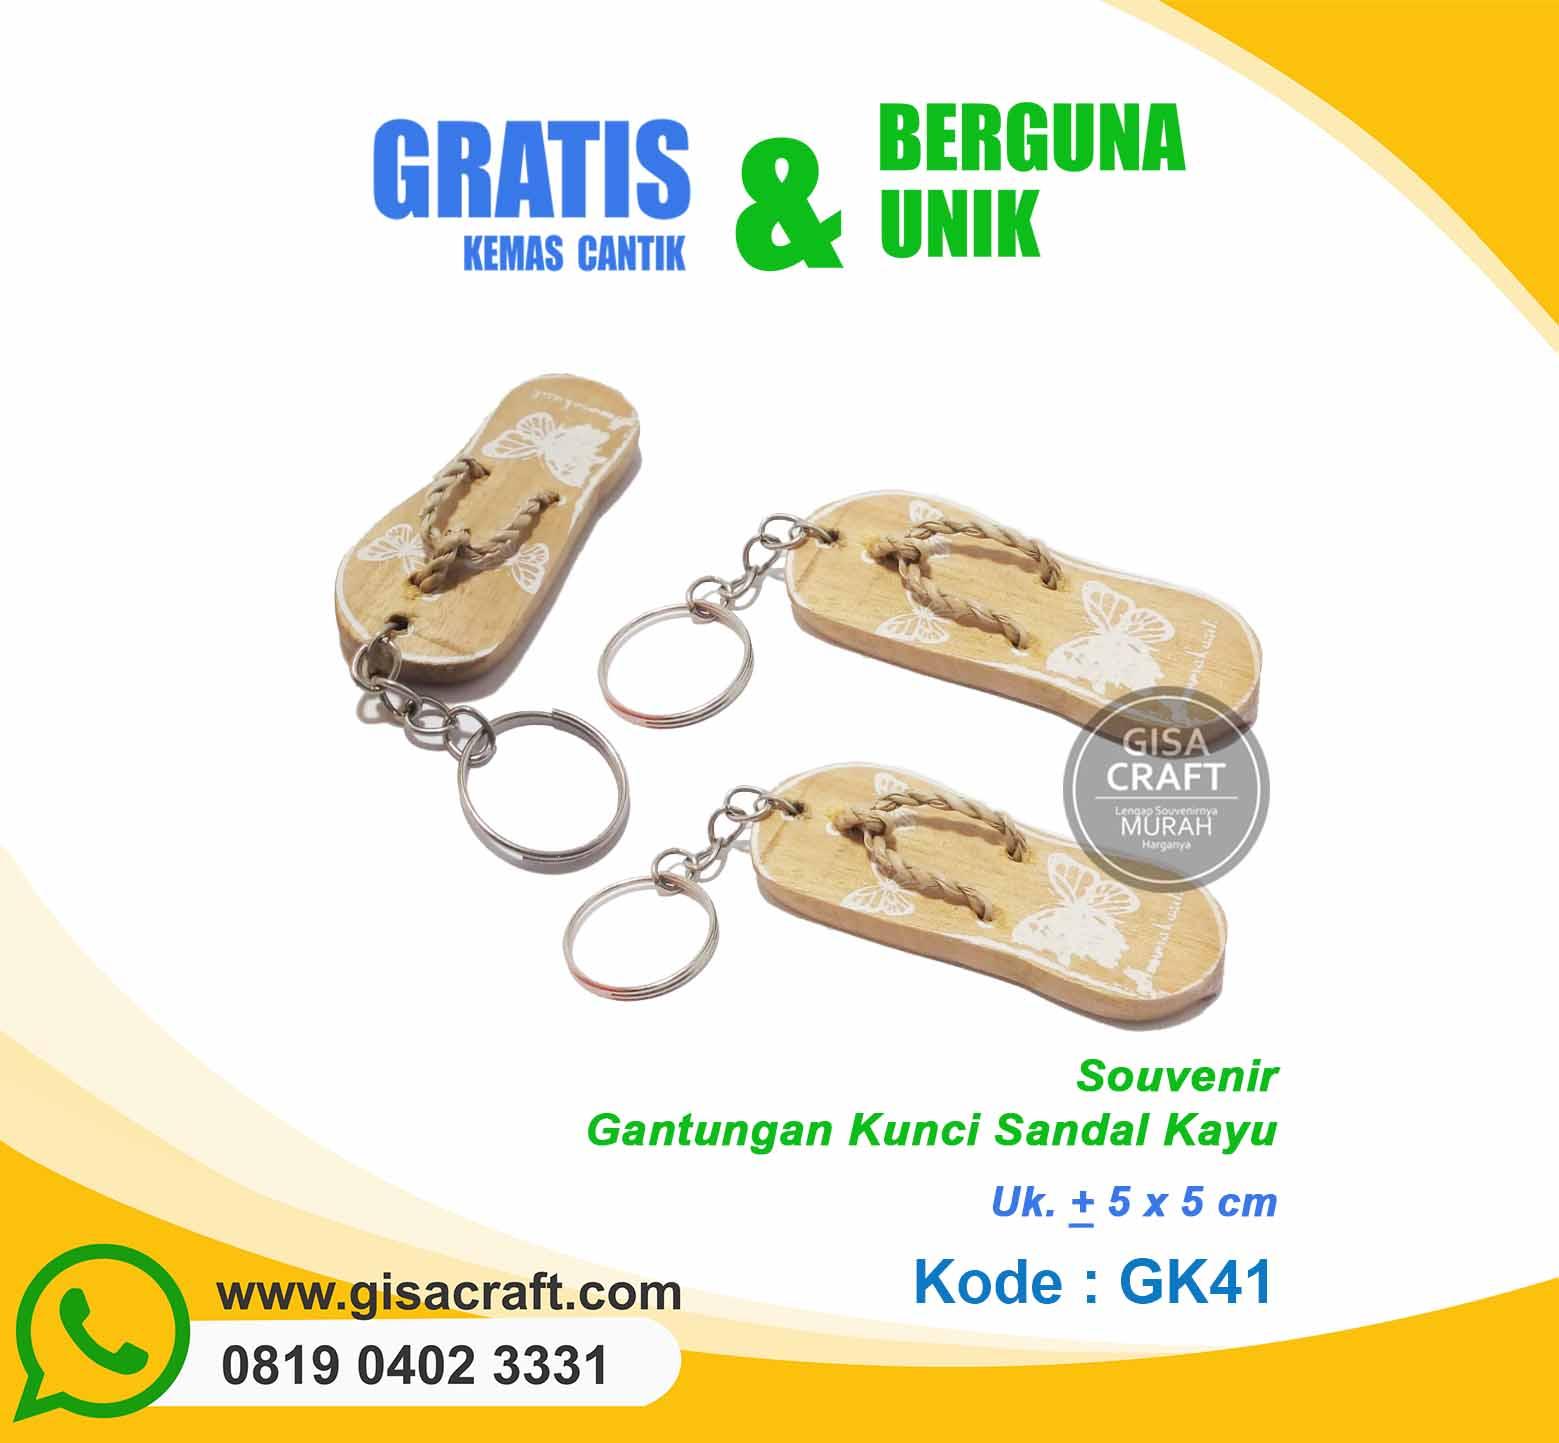 Souvenir Gantungan Kunci Sandal Kayu GK41